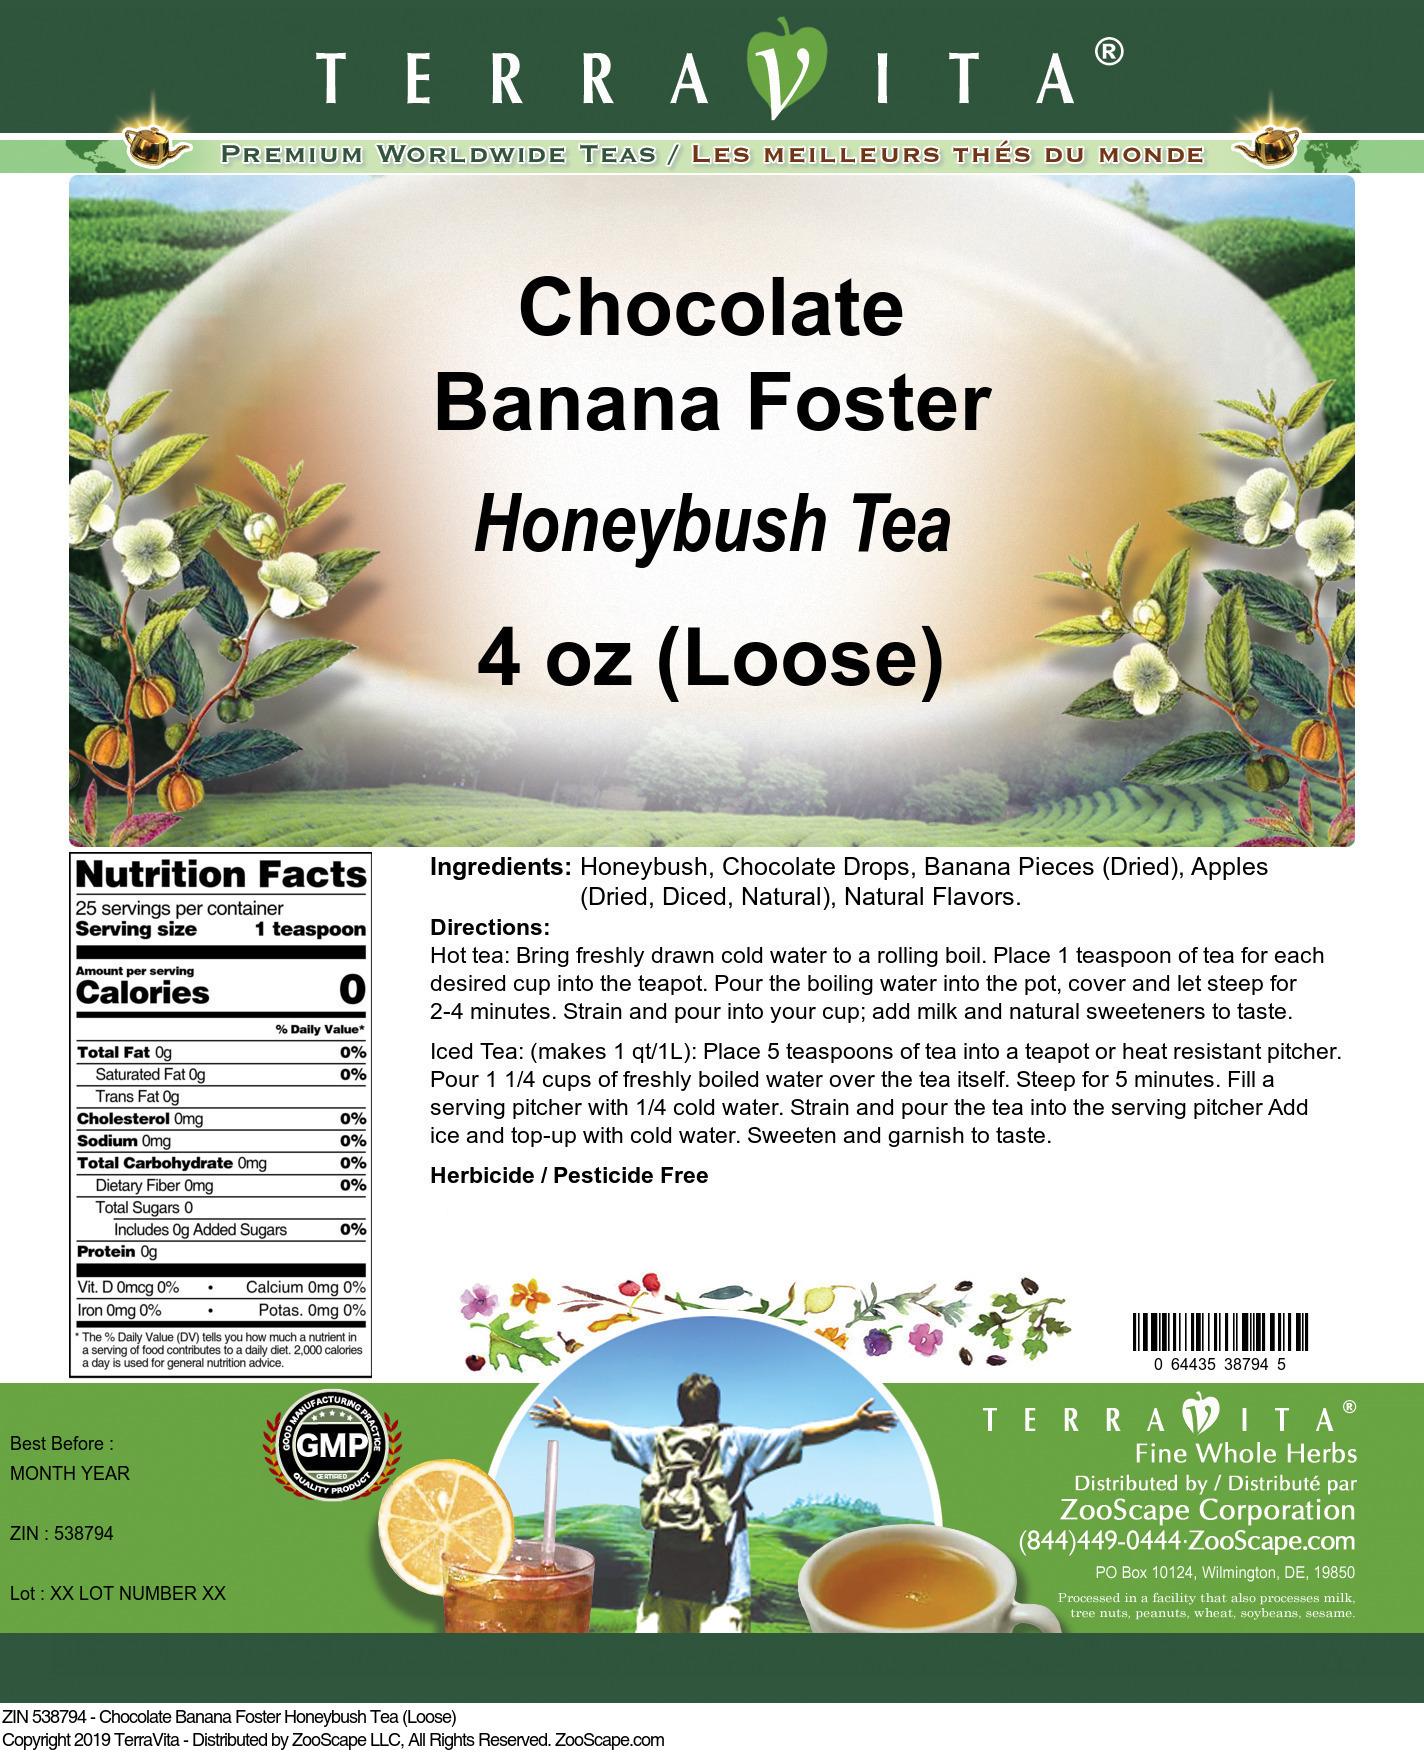 Chocolate Banana Foster Honeybush Tea (Loose)